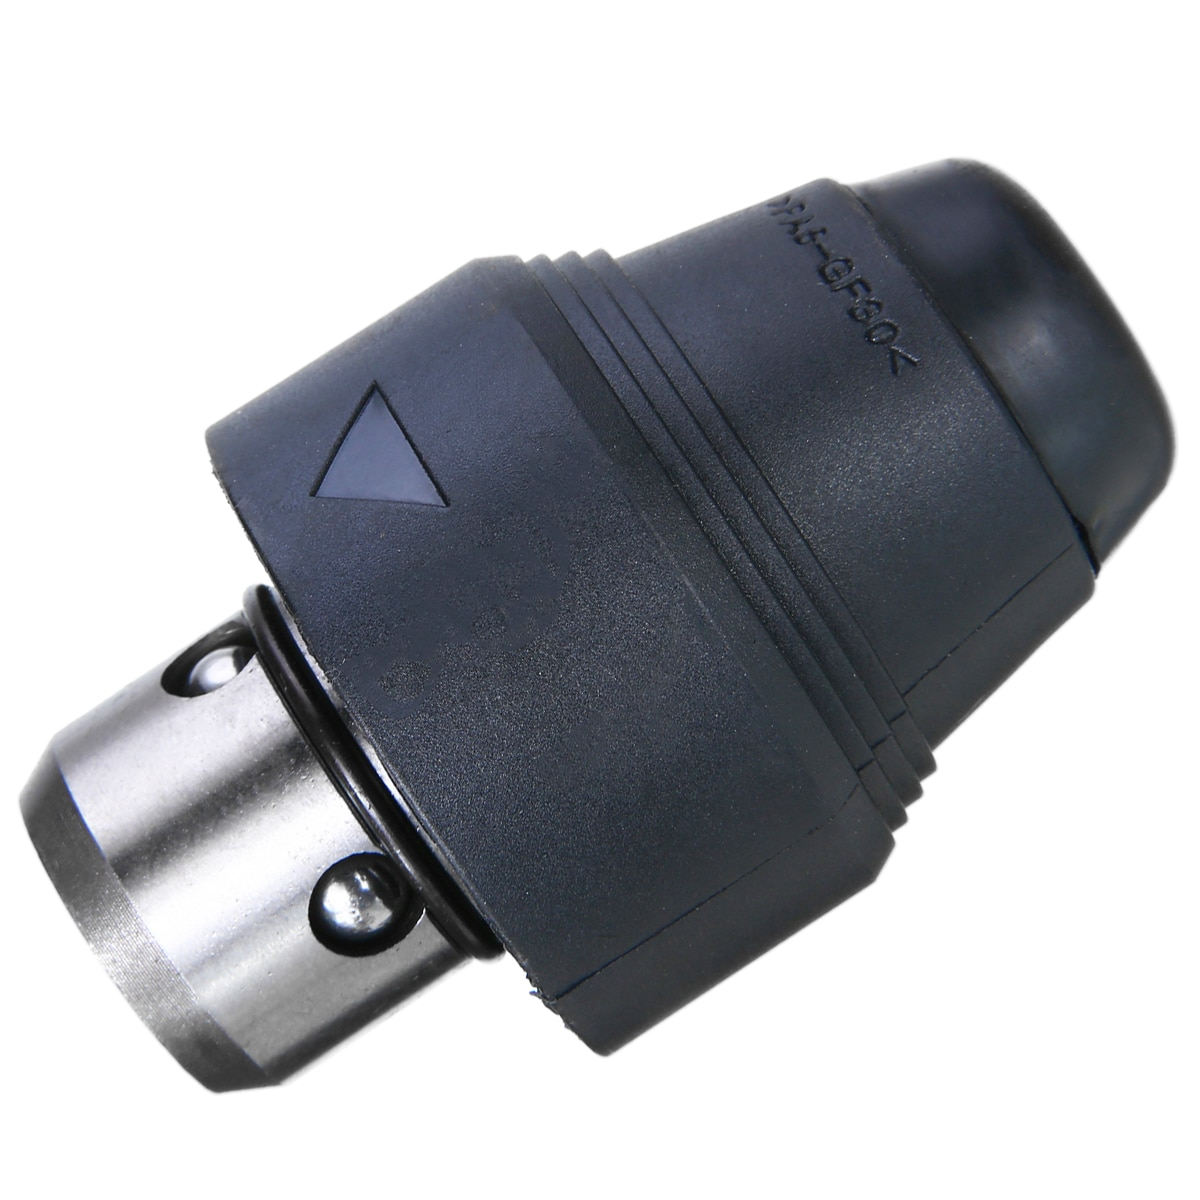 Mandrin SDS Plus pour Bosch GBH 2-26 DFR GBH 4-32 DFR Hand Tool